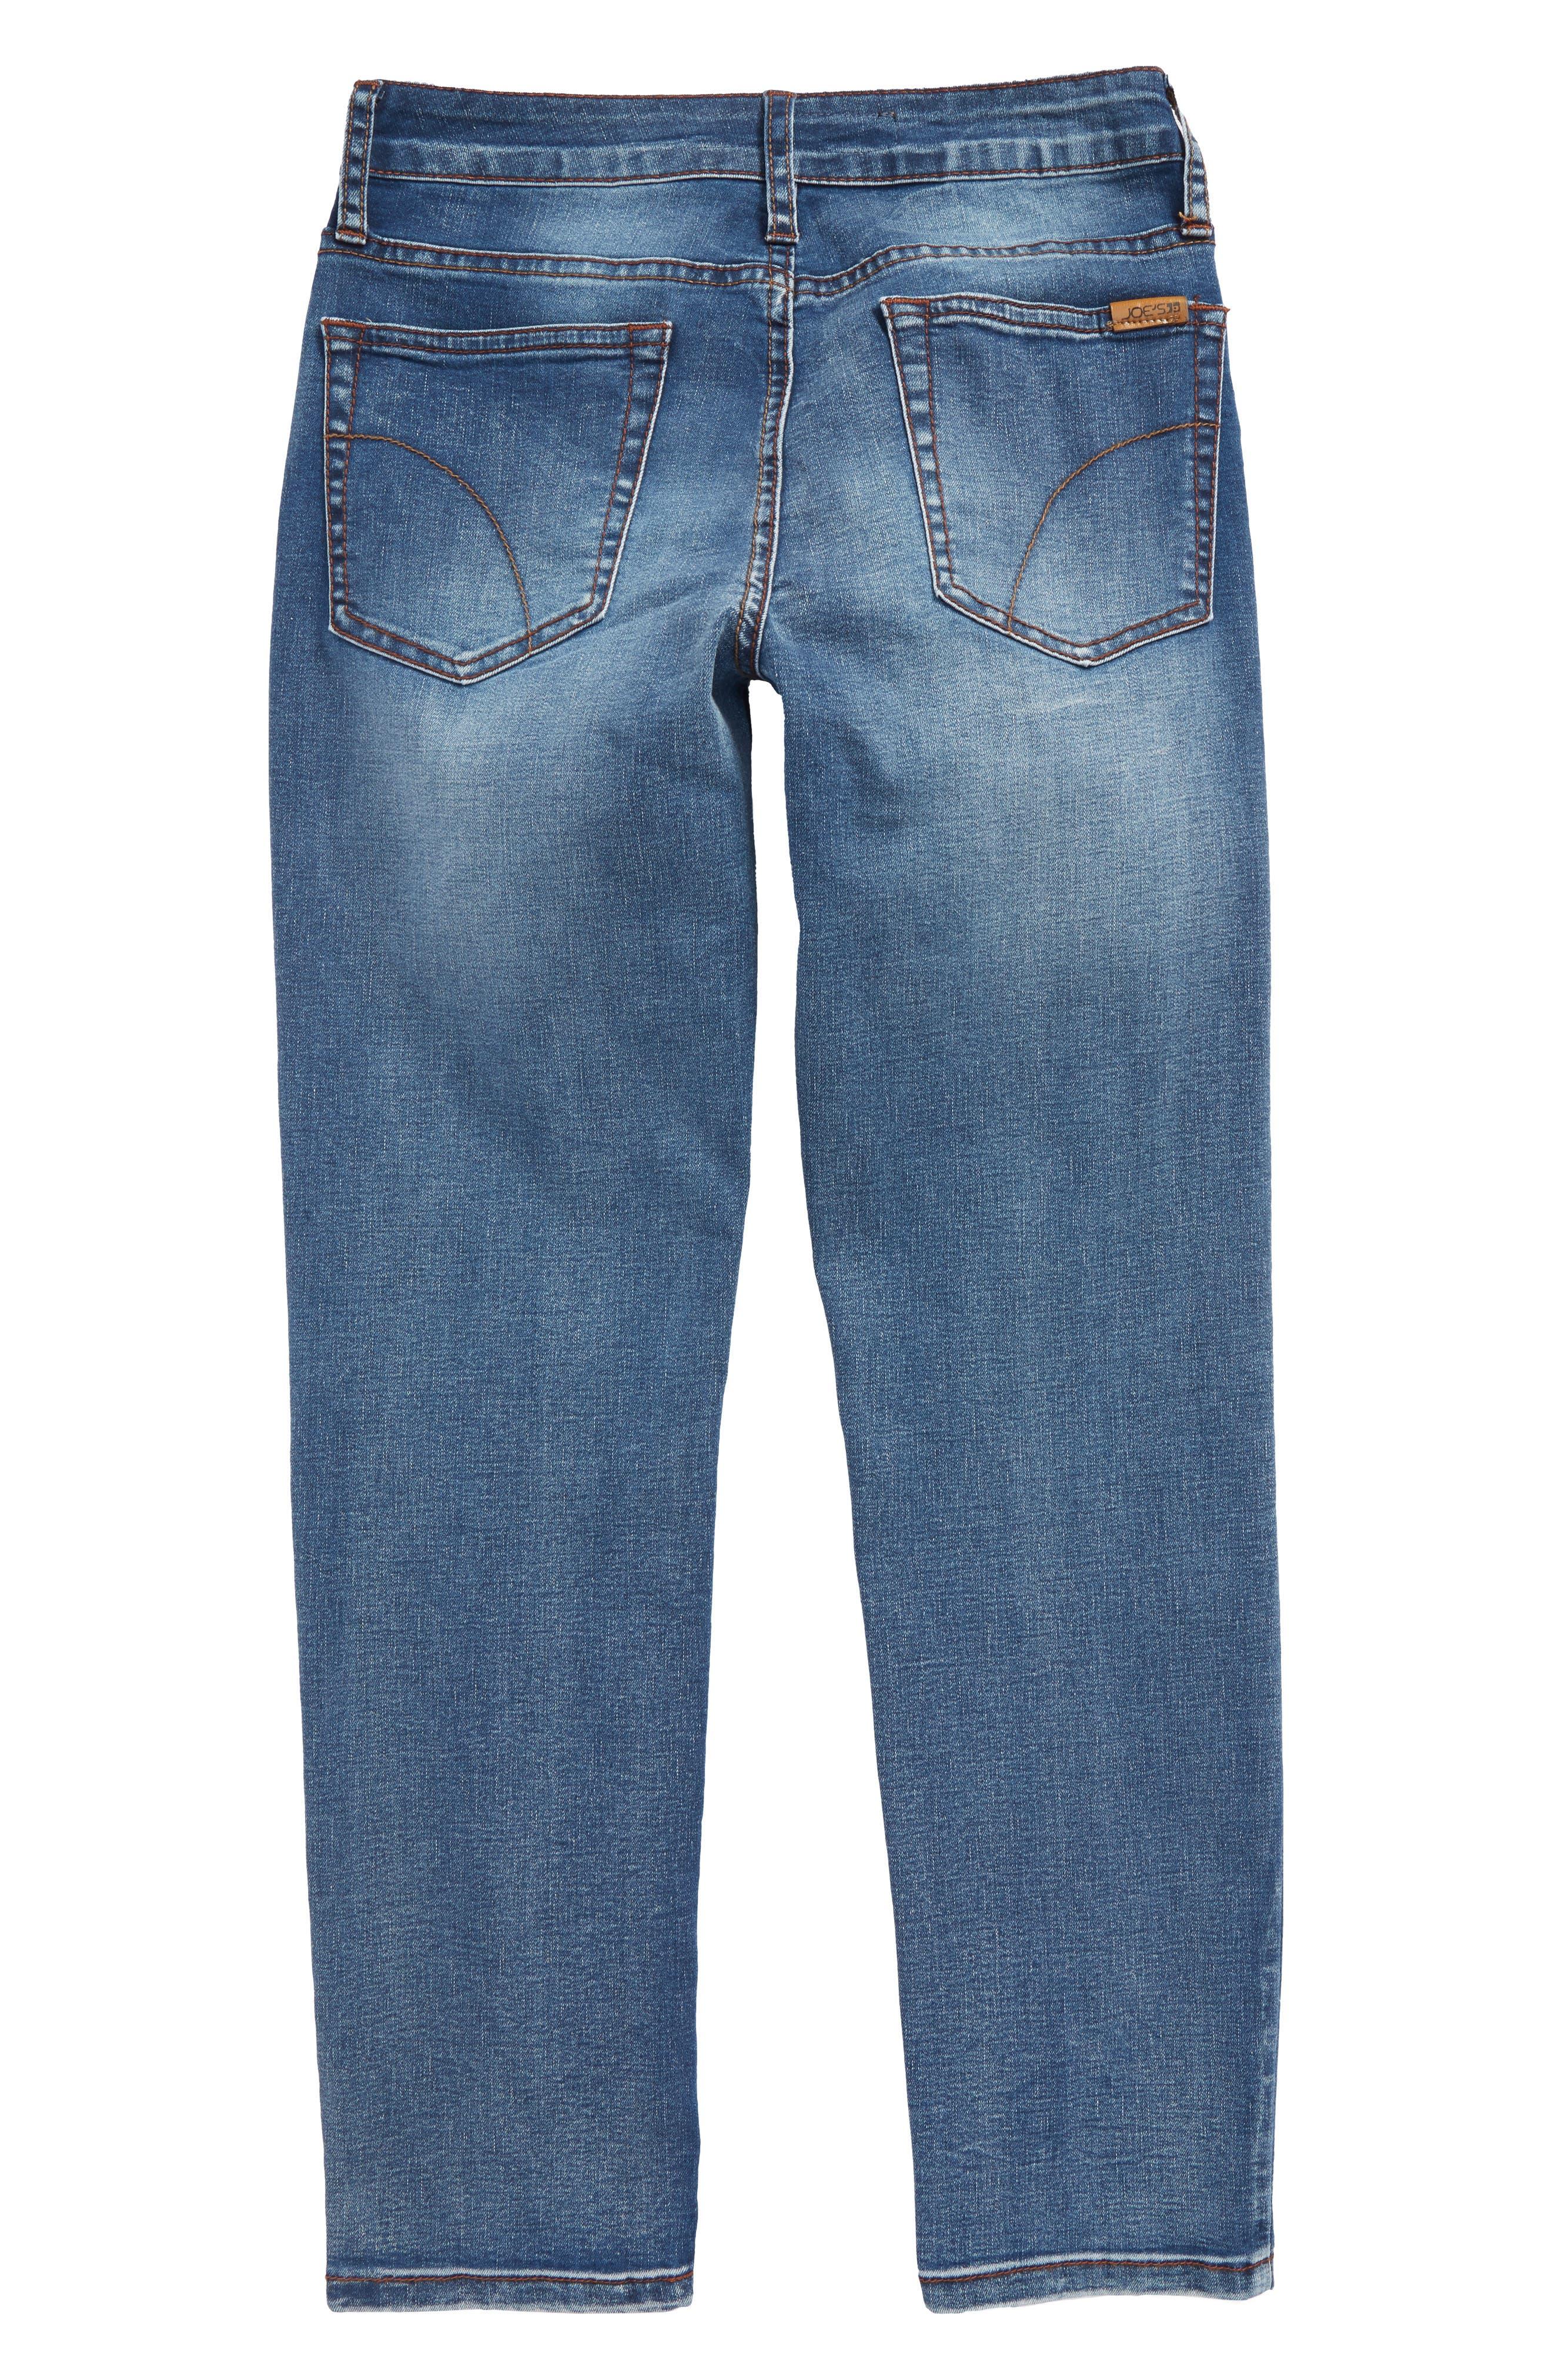 Brixton Slim Fit Stretch Jeans,                             Alternate thumbnail 2, color,                             Cielo